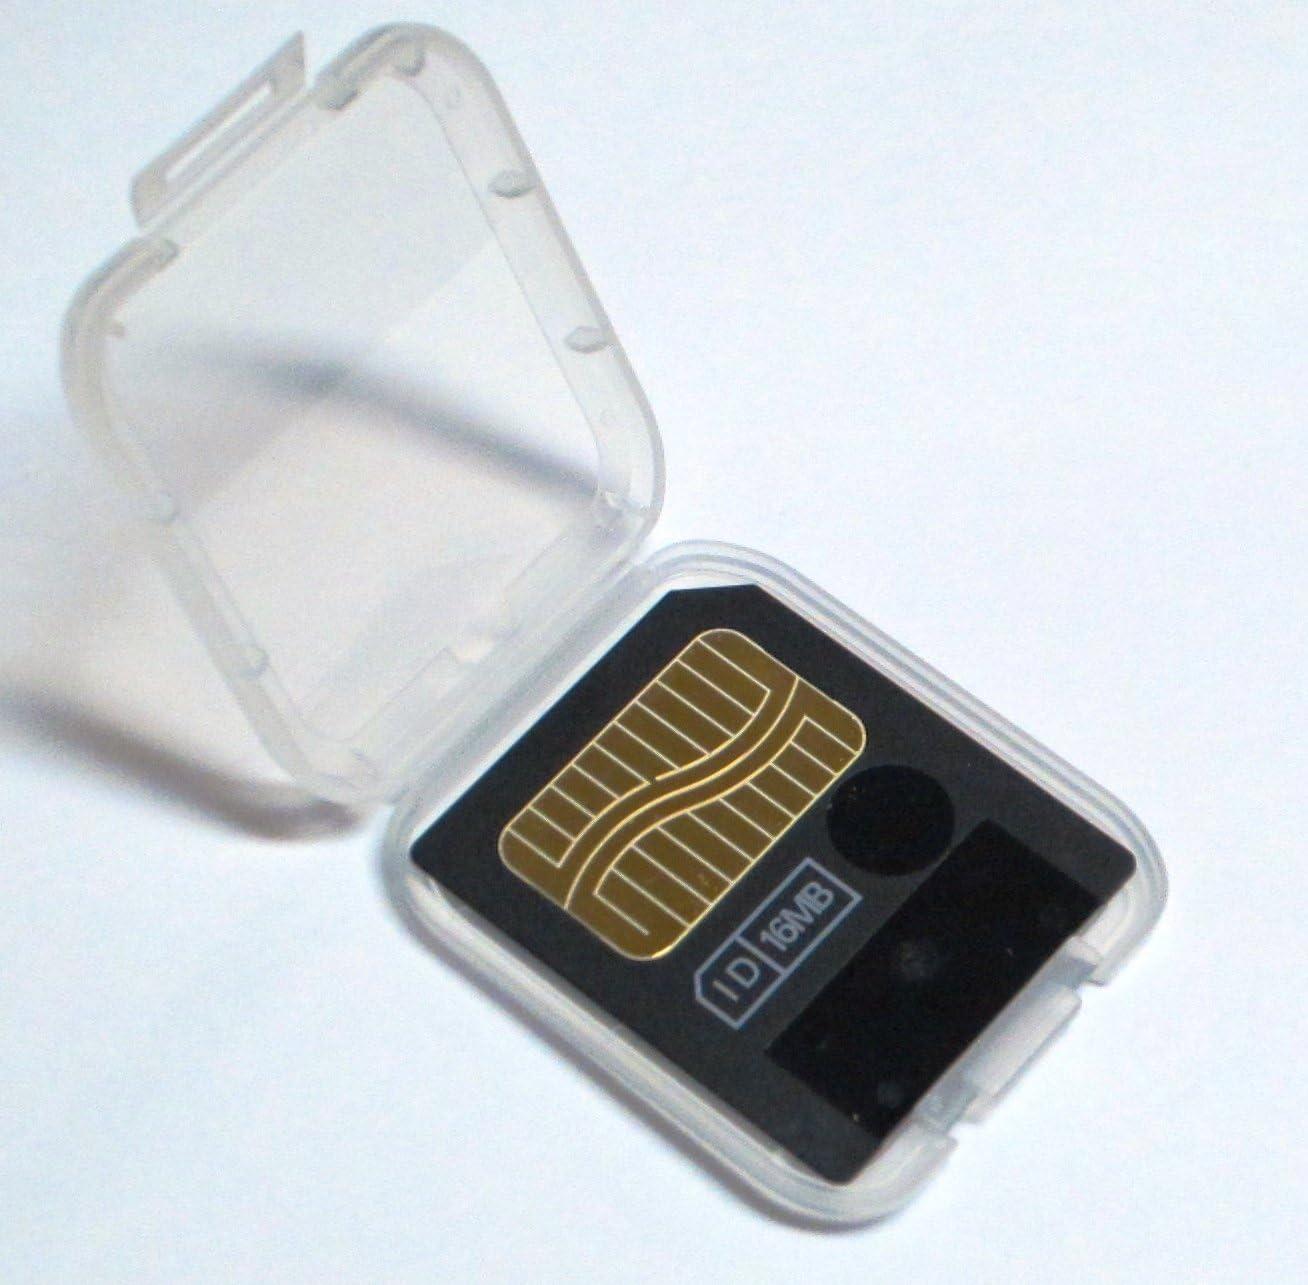 32MB SM SmartMedia 32MB SM 3.3V Memory Card Made by Toshiba W//Case GENUINE NEW